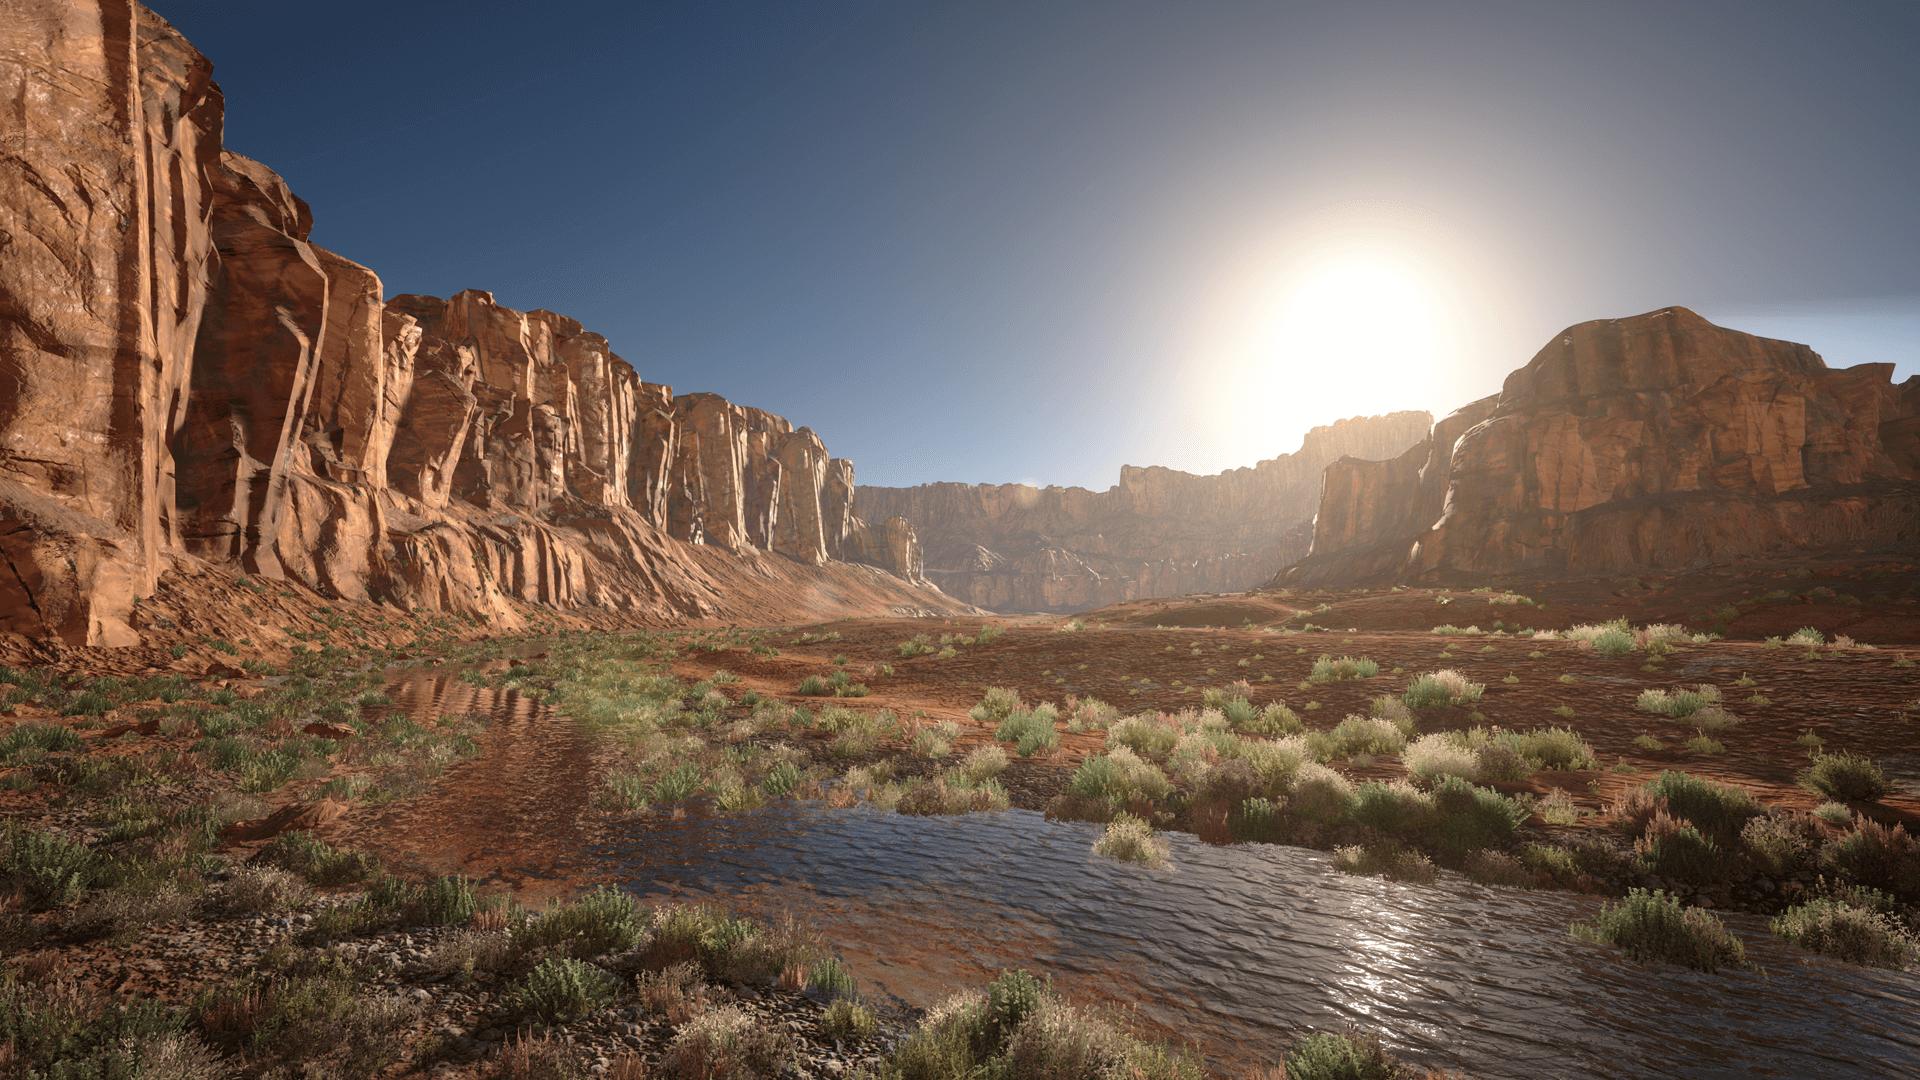 Photorealistic Landscape Pack 3 by Gokhan Karadayi in